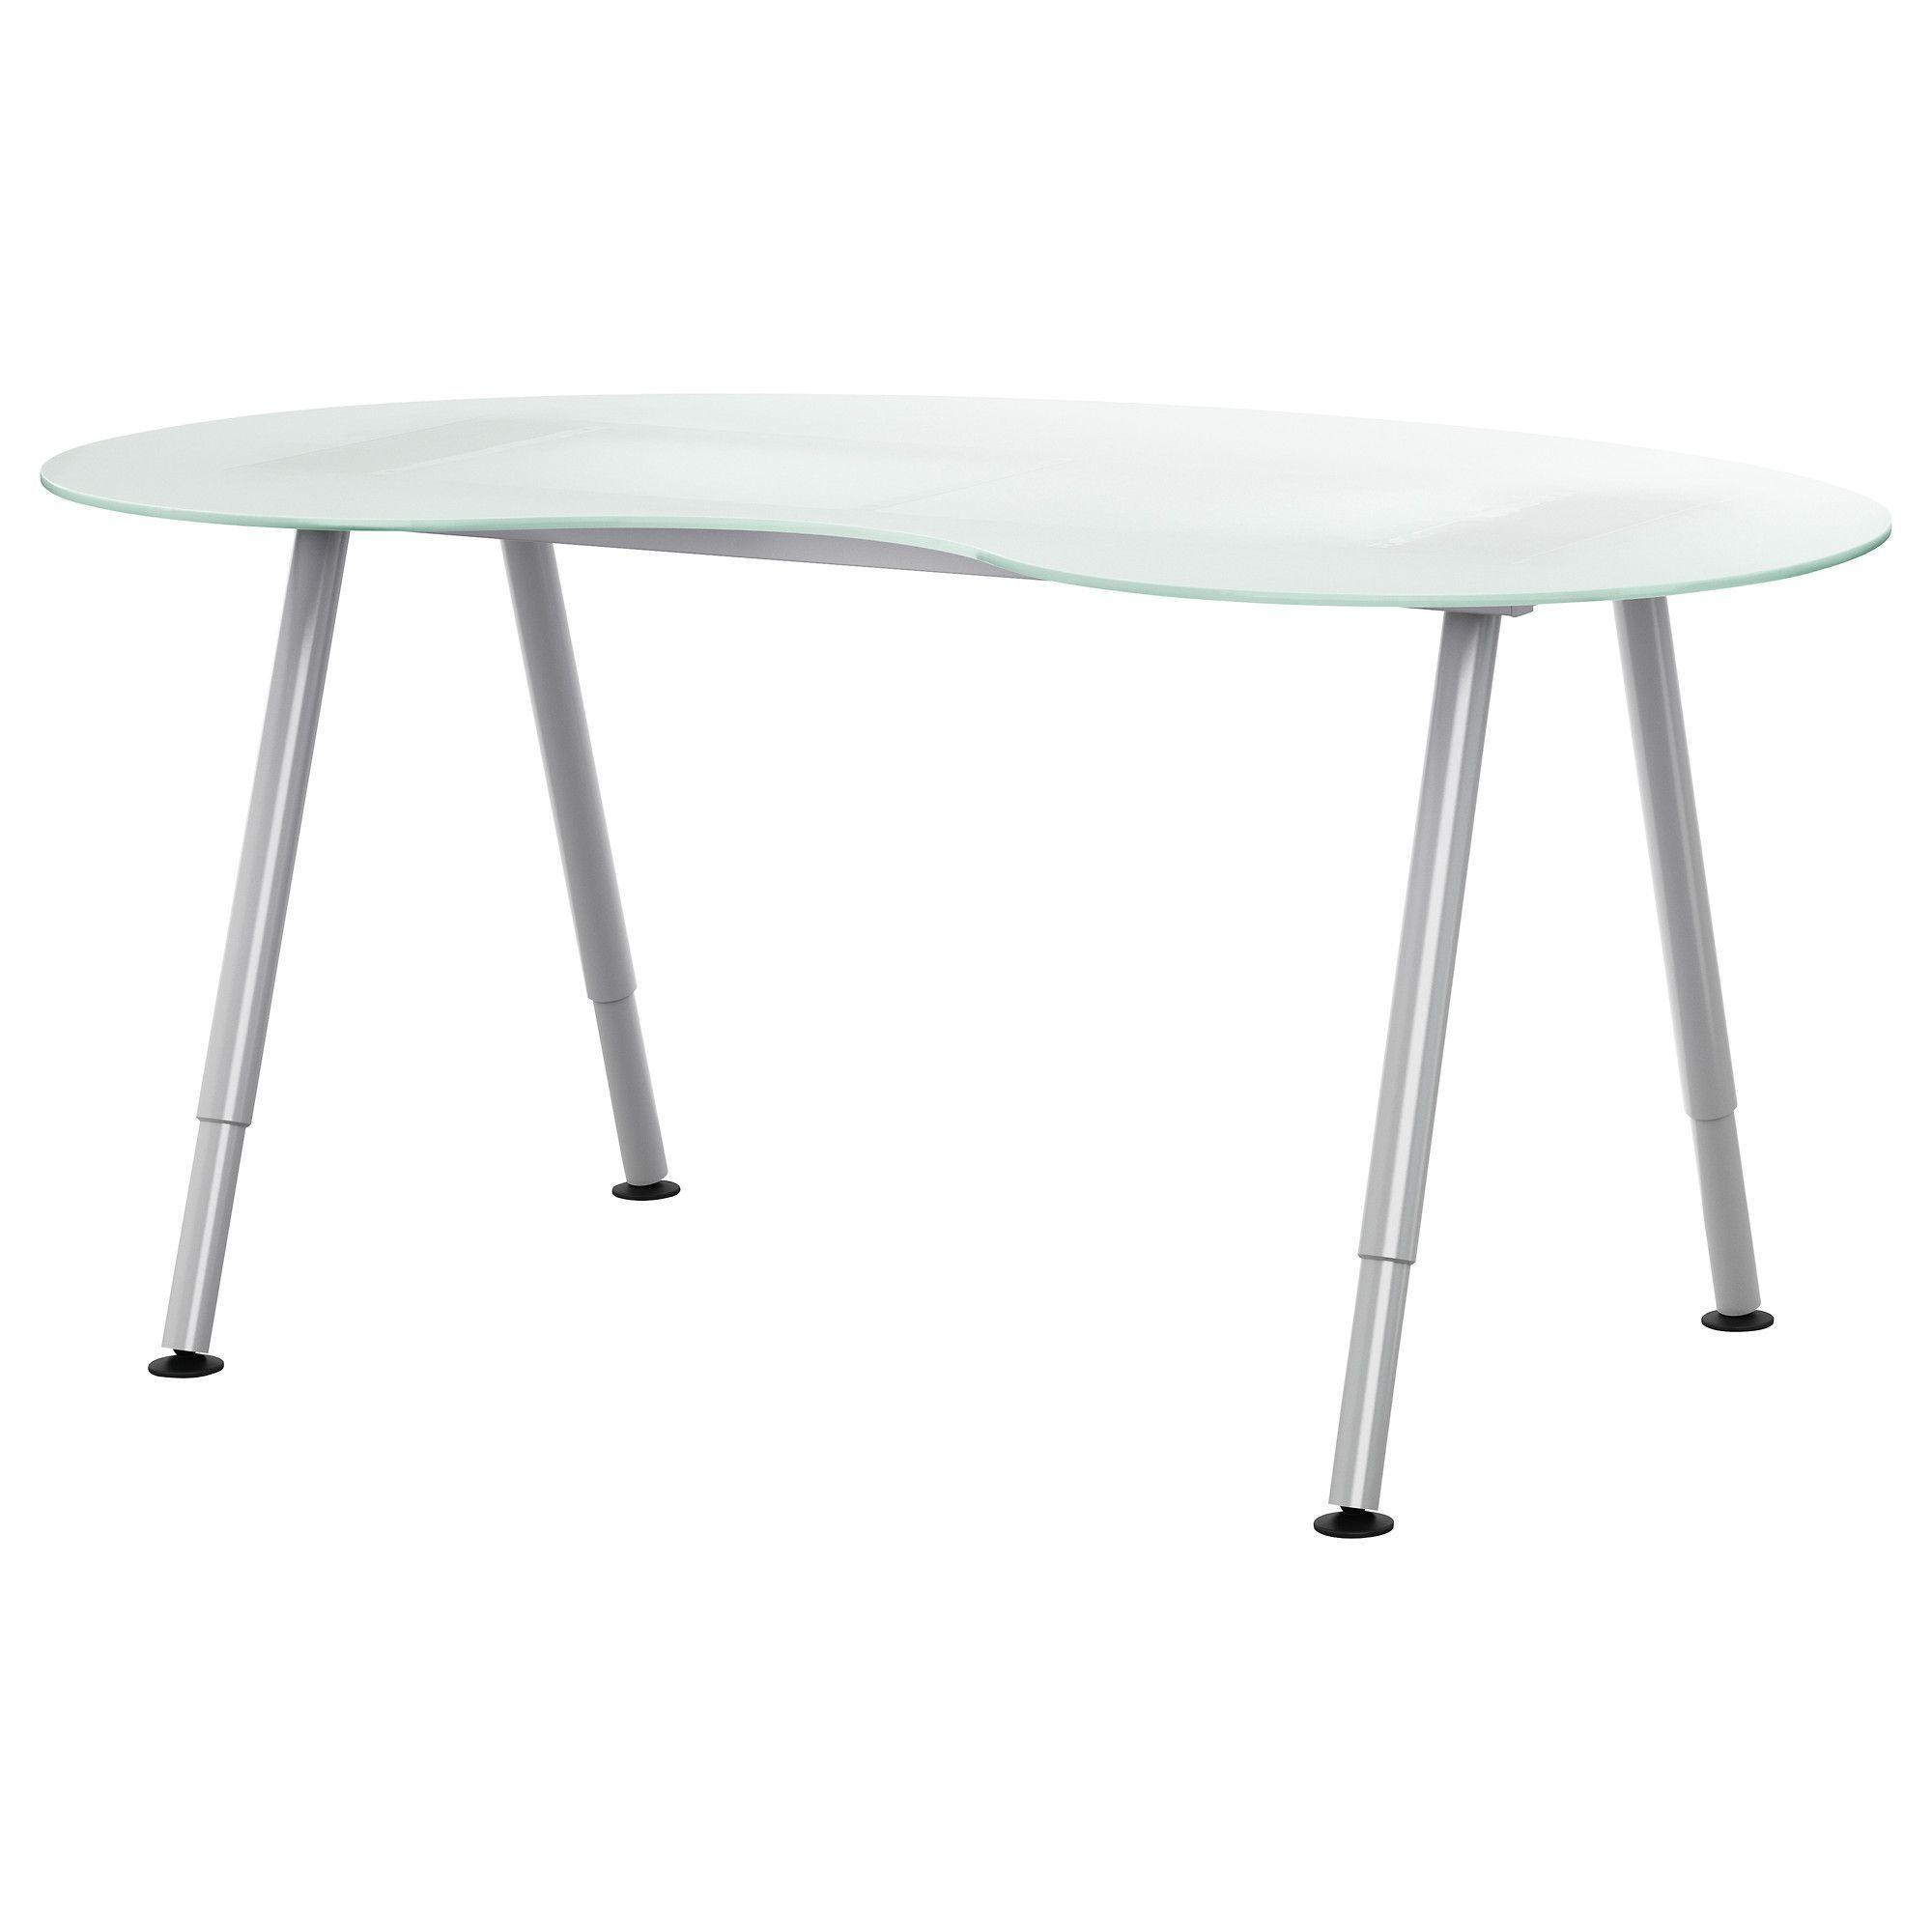 Ikea Galant Office Desk Ikea Glass Table Ikea Galant Ikea Glass Desk